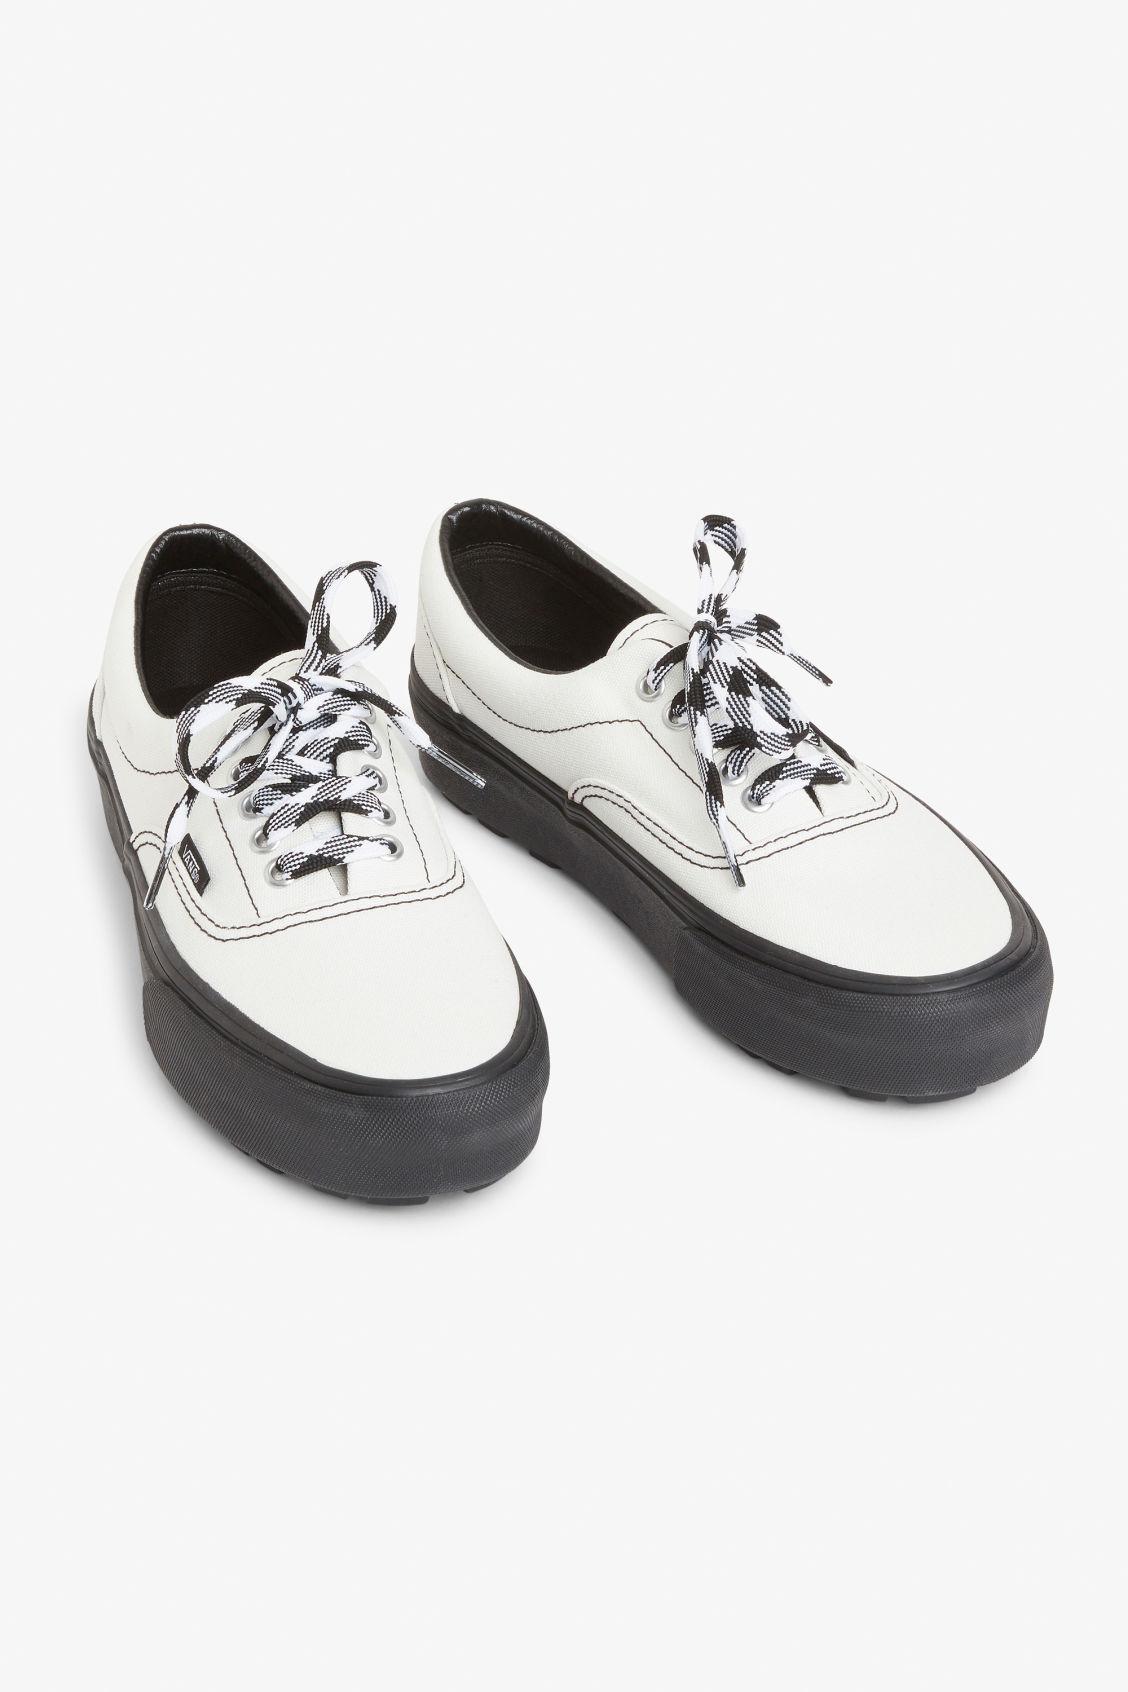 45db2e5dafe Vans era 90s platforms - Cloud dancer - Shoes - Monki